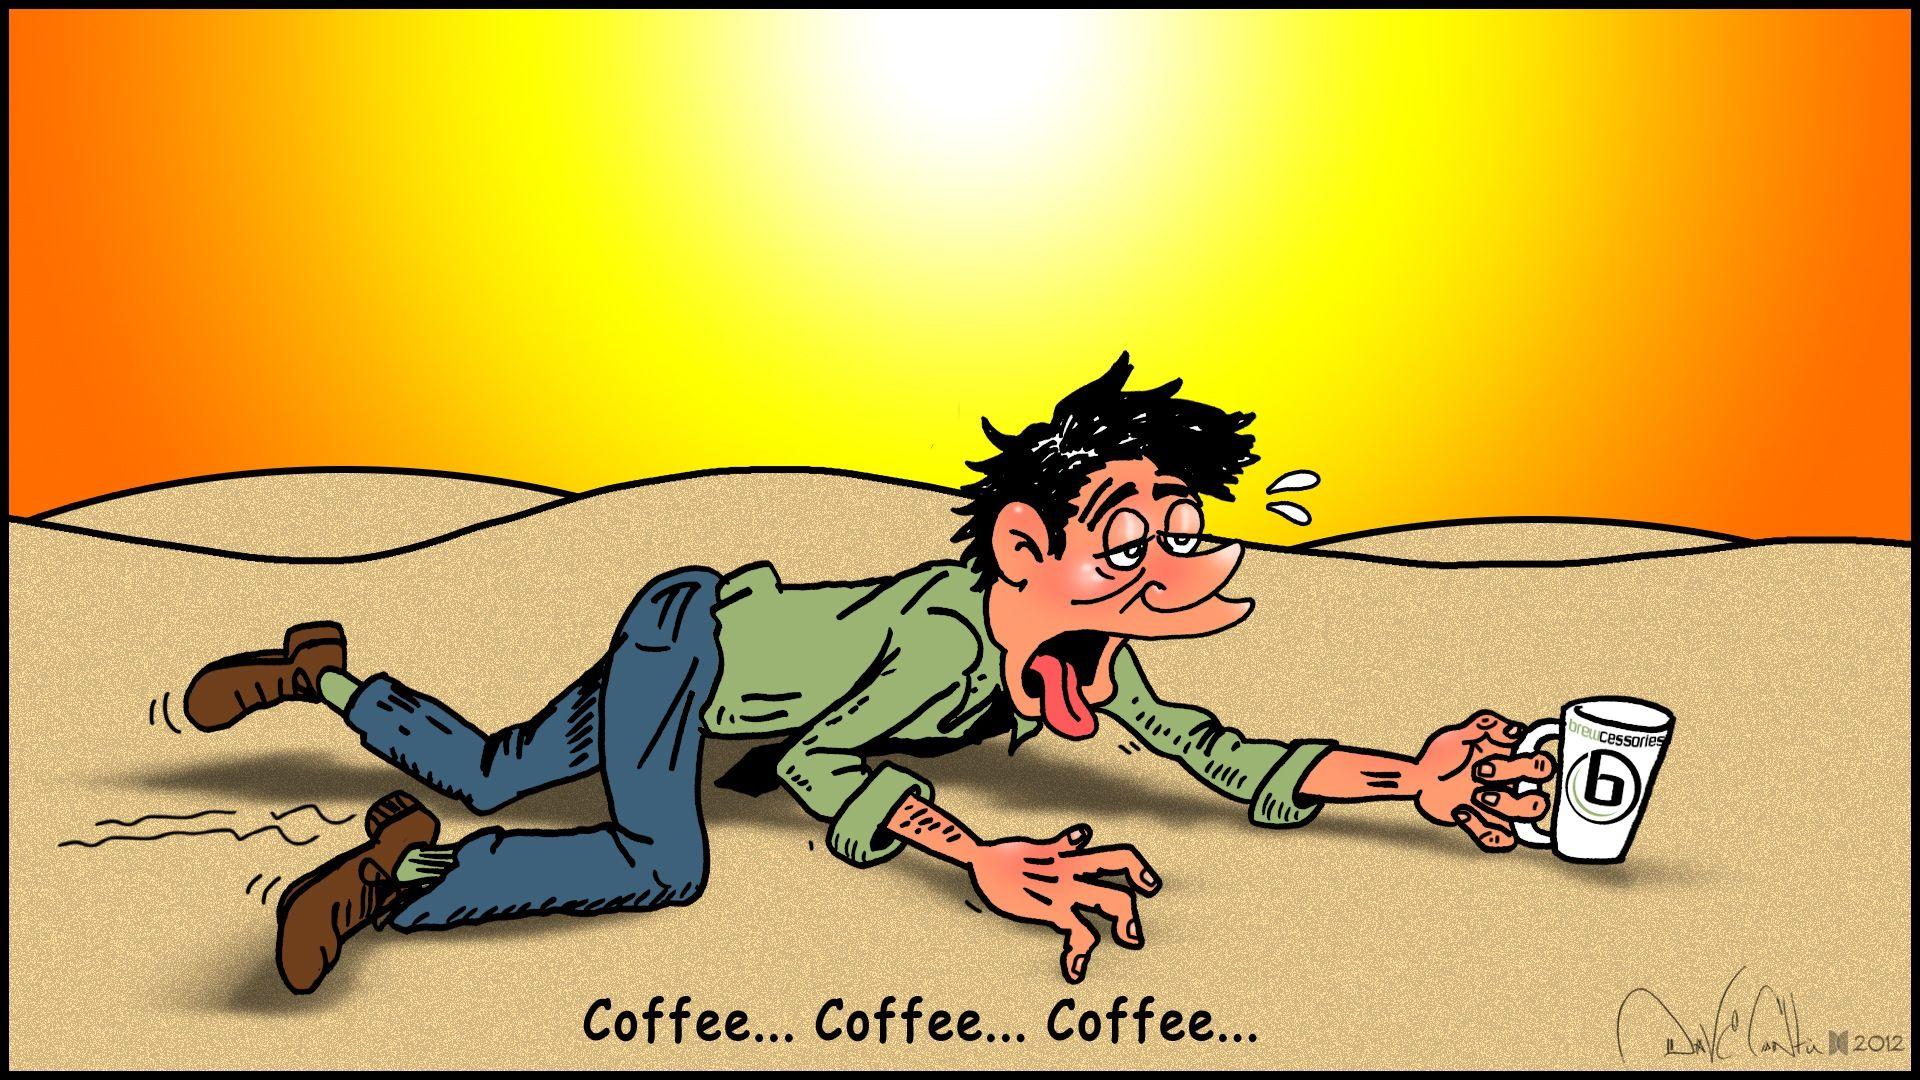 My kingdom for an iced coffee!